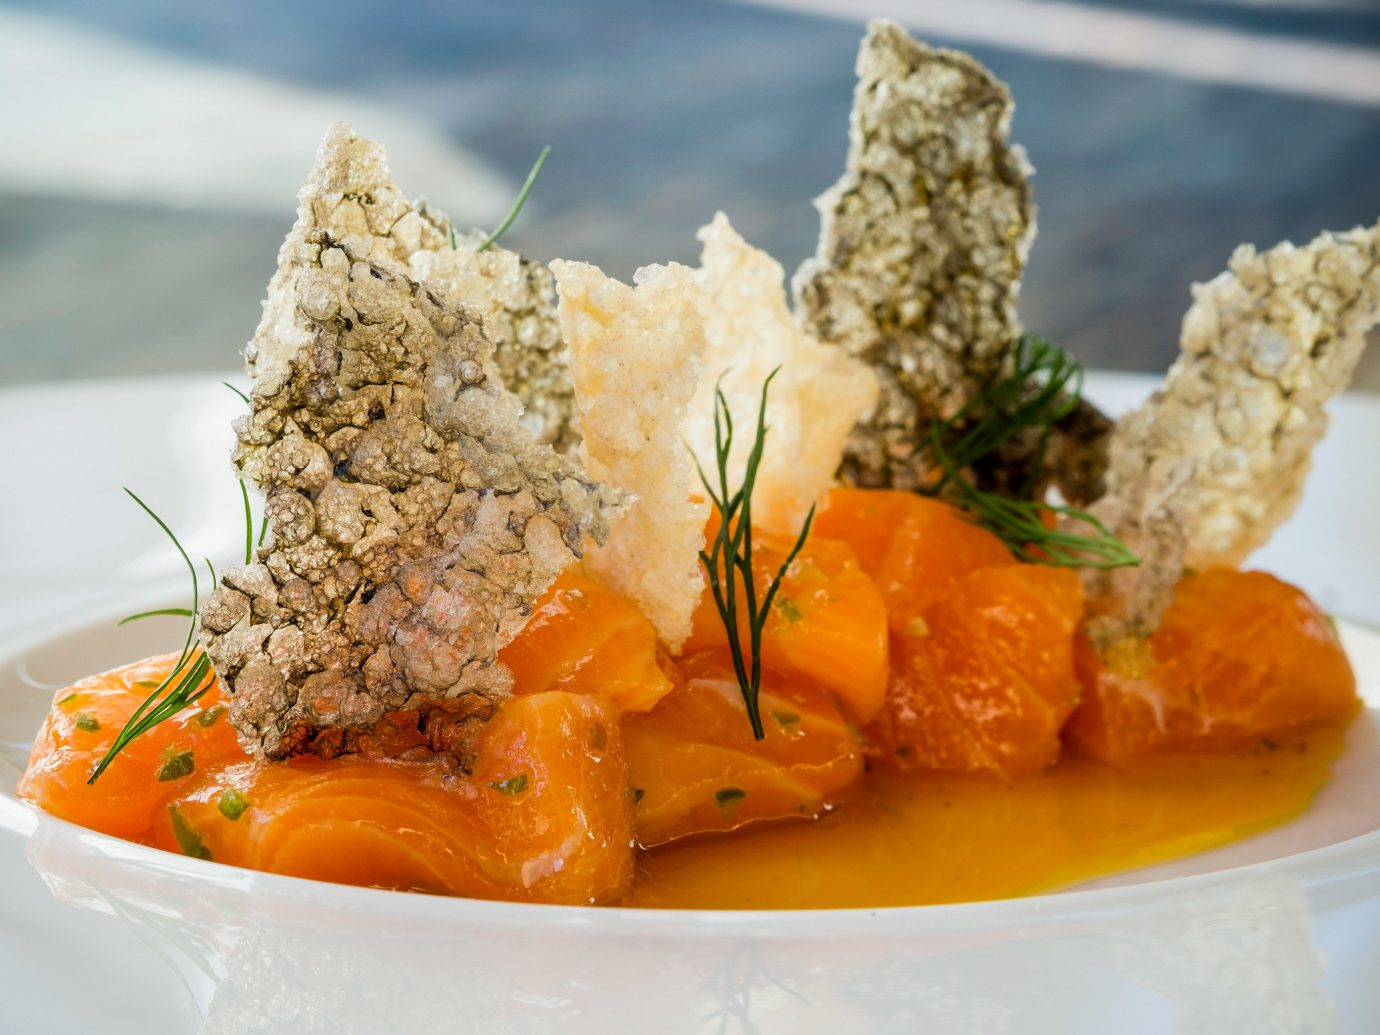 Food + Drink Phildelphia food plate dish vegetarian food vegetable cuisine smoked salmon recipe meat piece de resistance